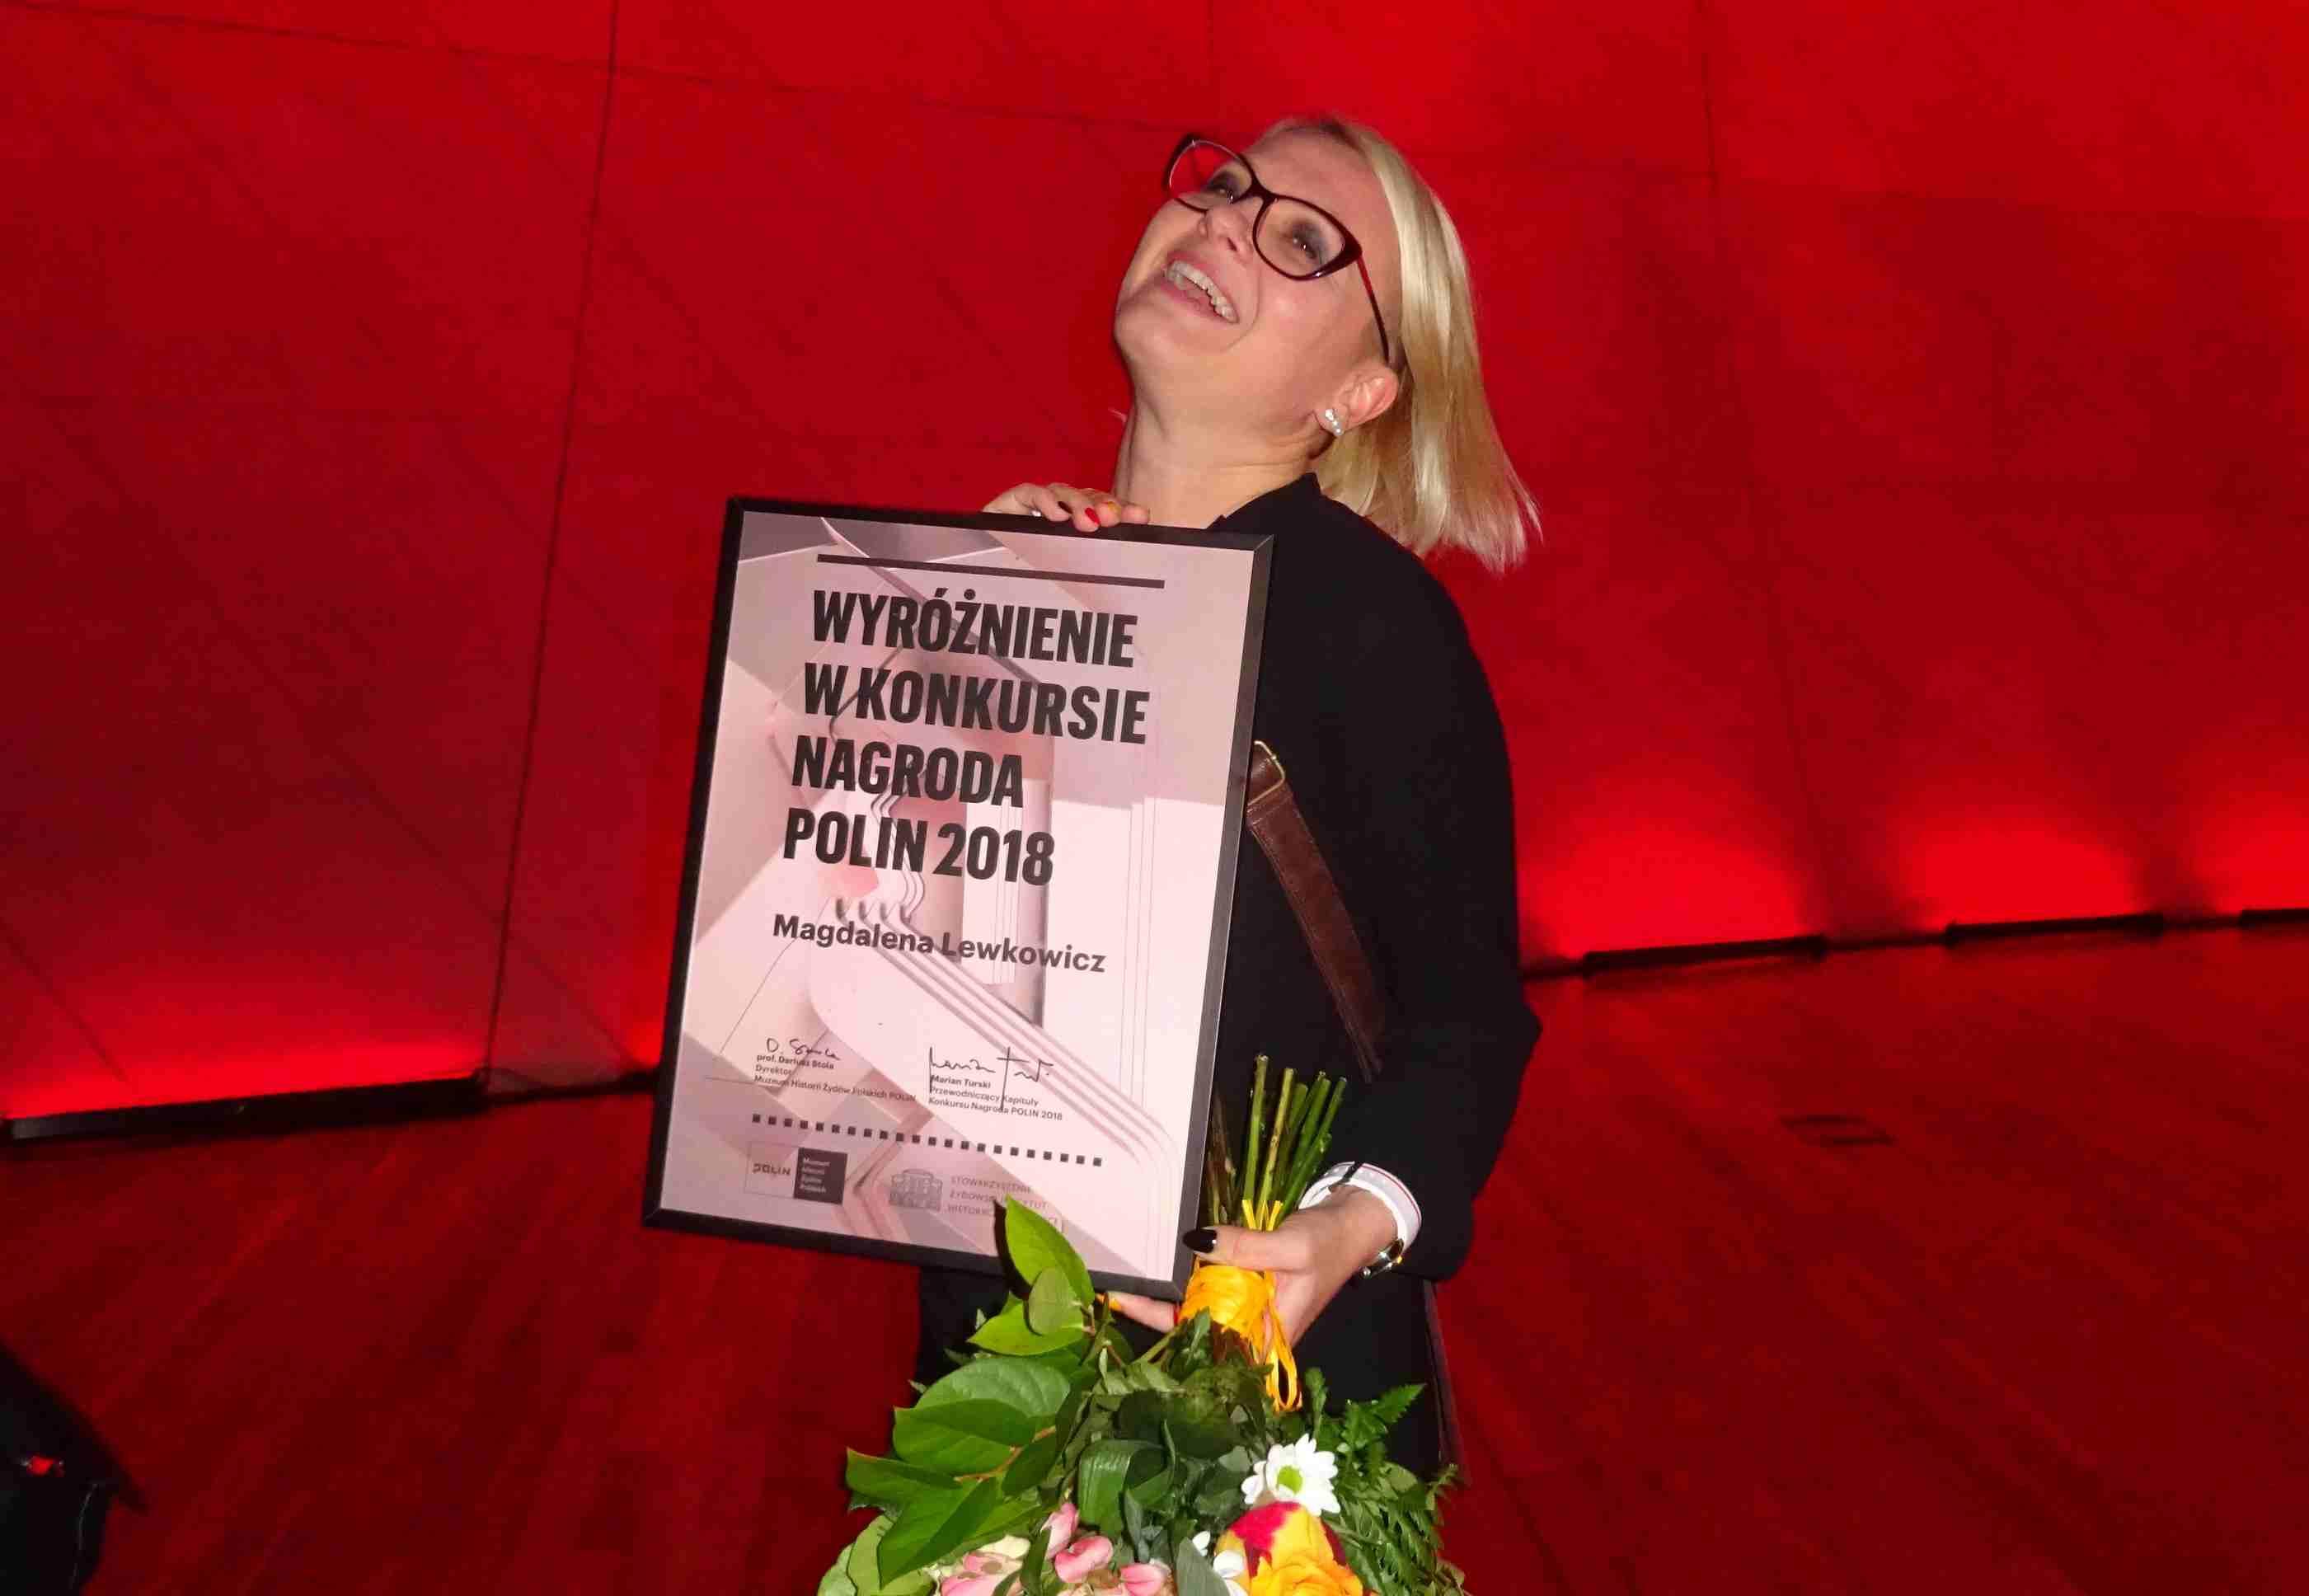 Magdalena Lewkowicz from Mrągowo awarded the POLIN 2018 Prize